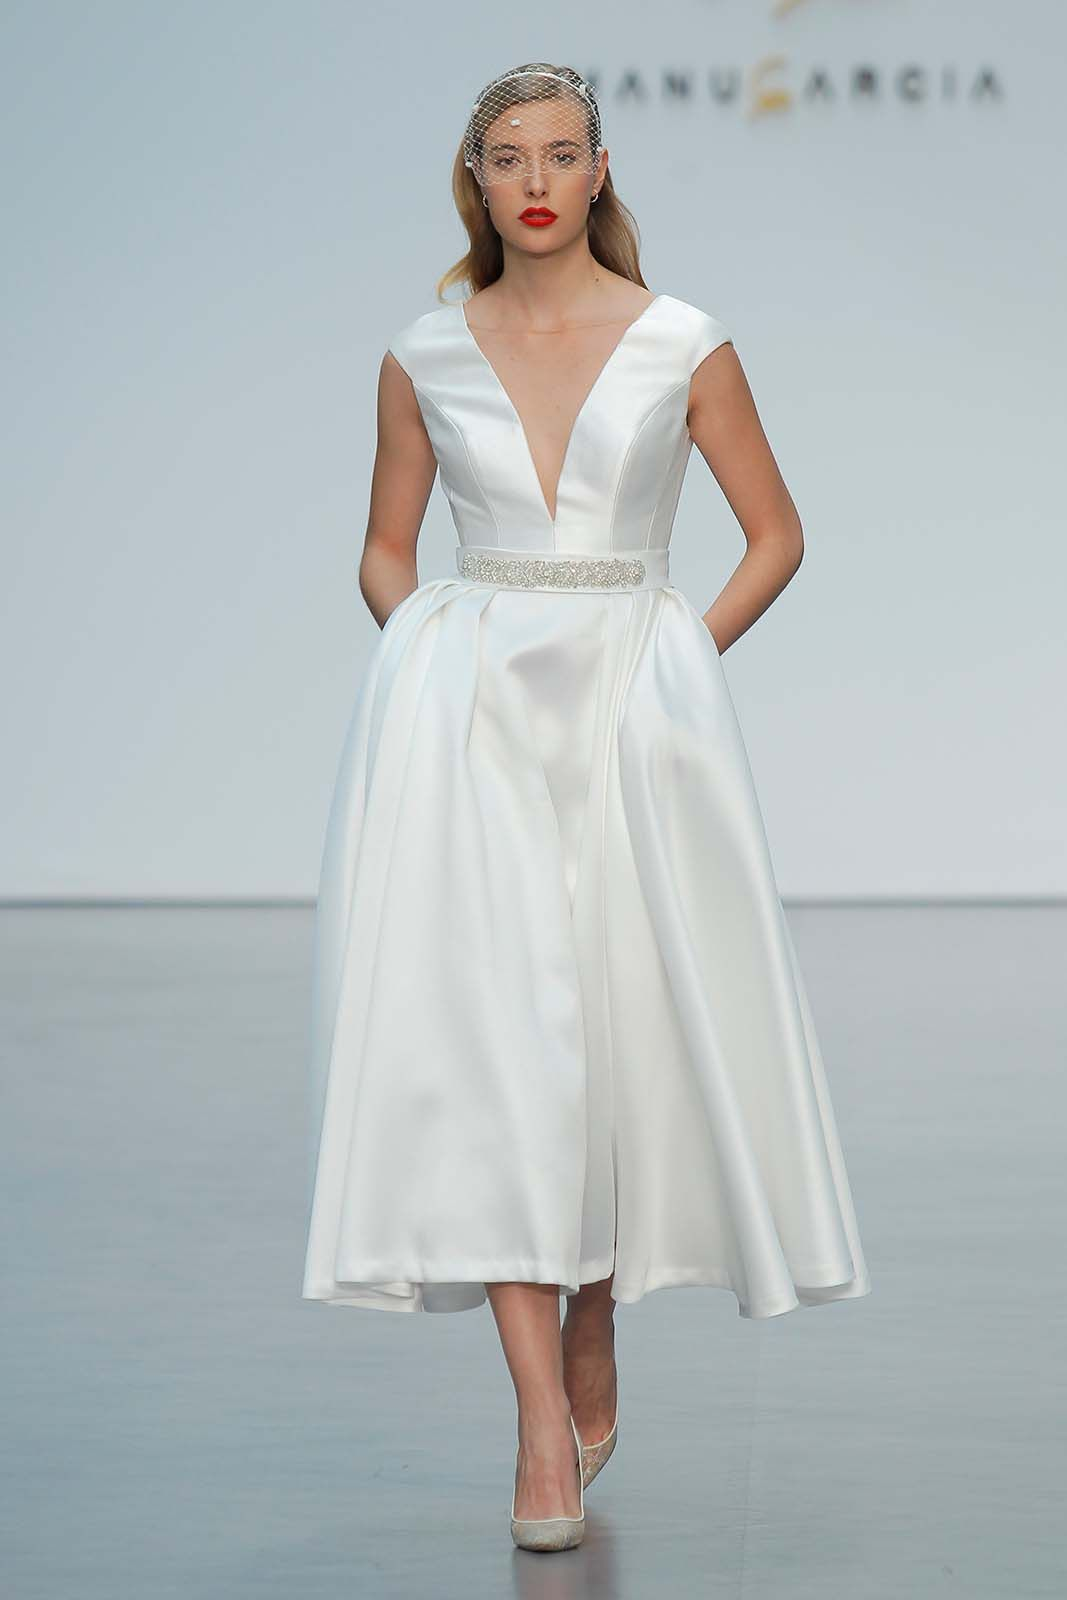 Vestido de Novia de Manu García - 1623900 #wedding #bodas #boda ...